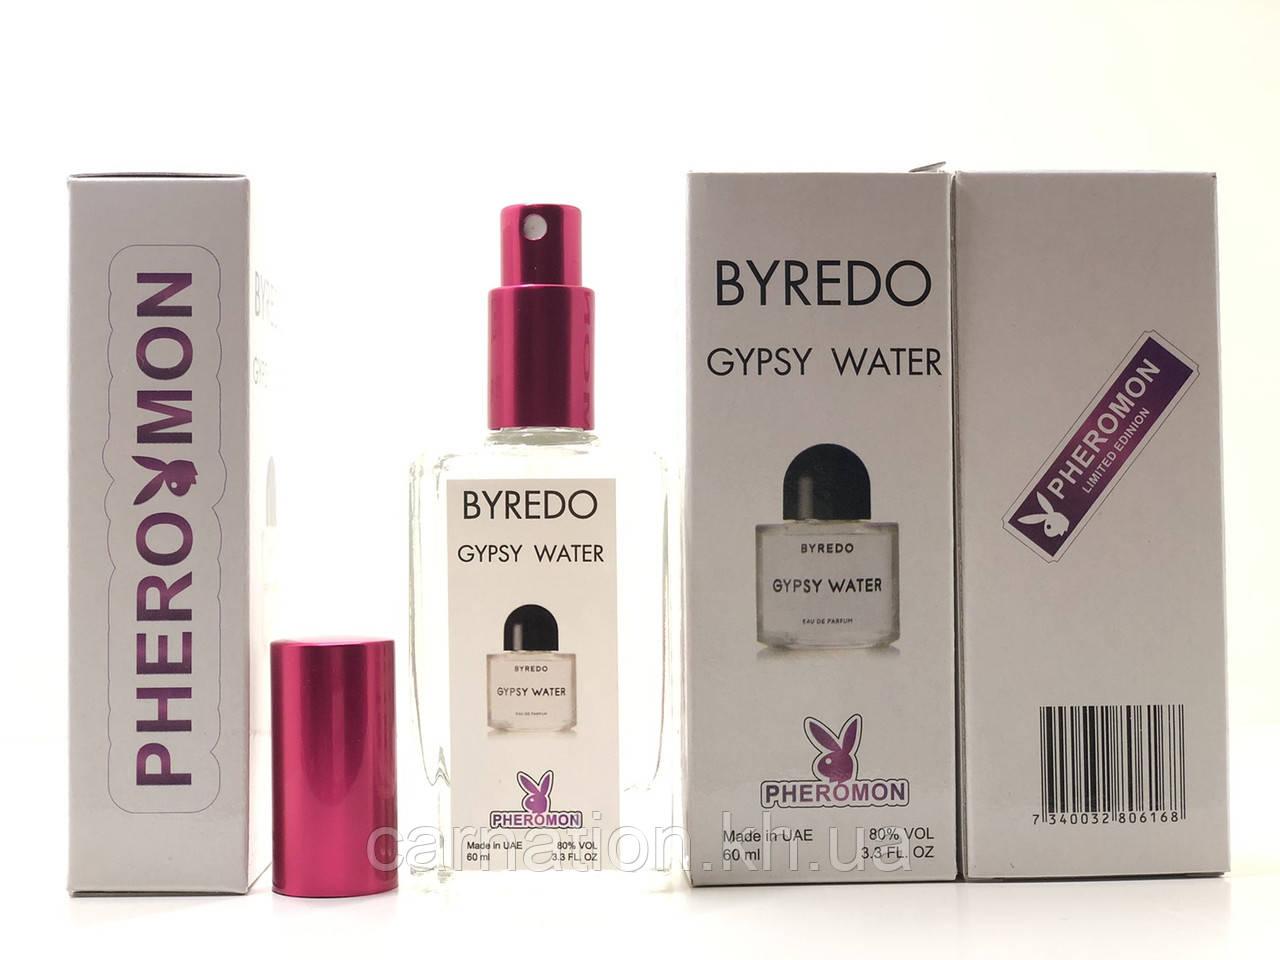 Тестер унисекс Byredo Gypsy Water (Байредо Джипси Вотер) 60 мл